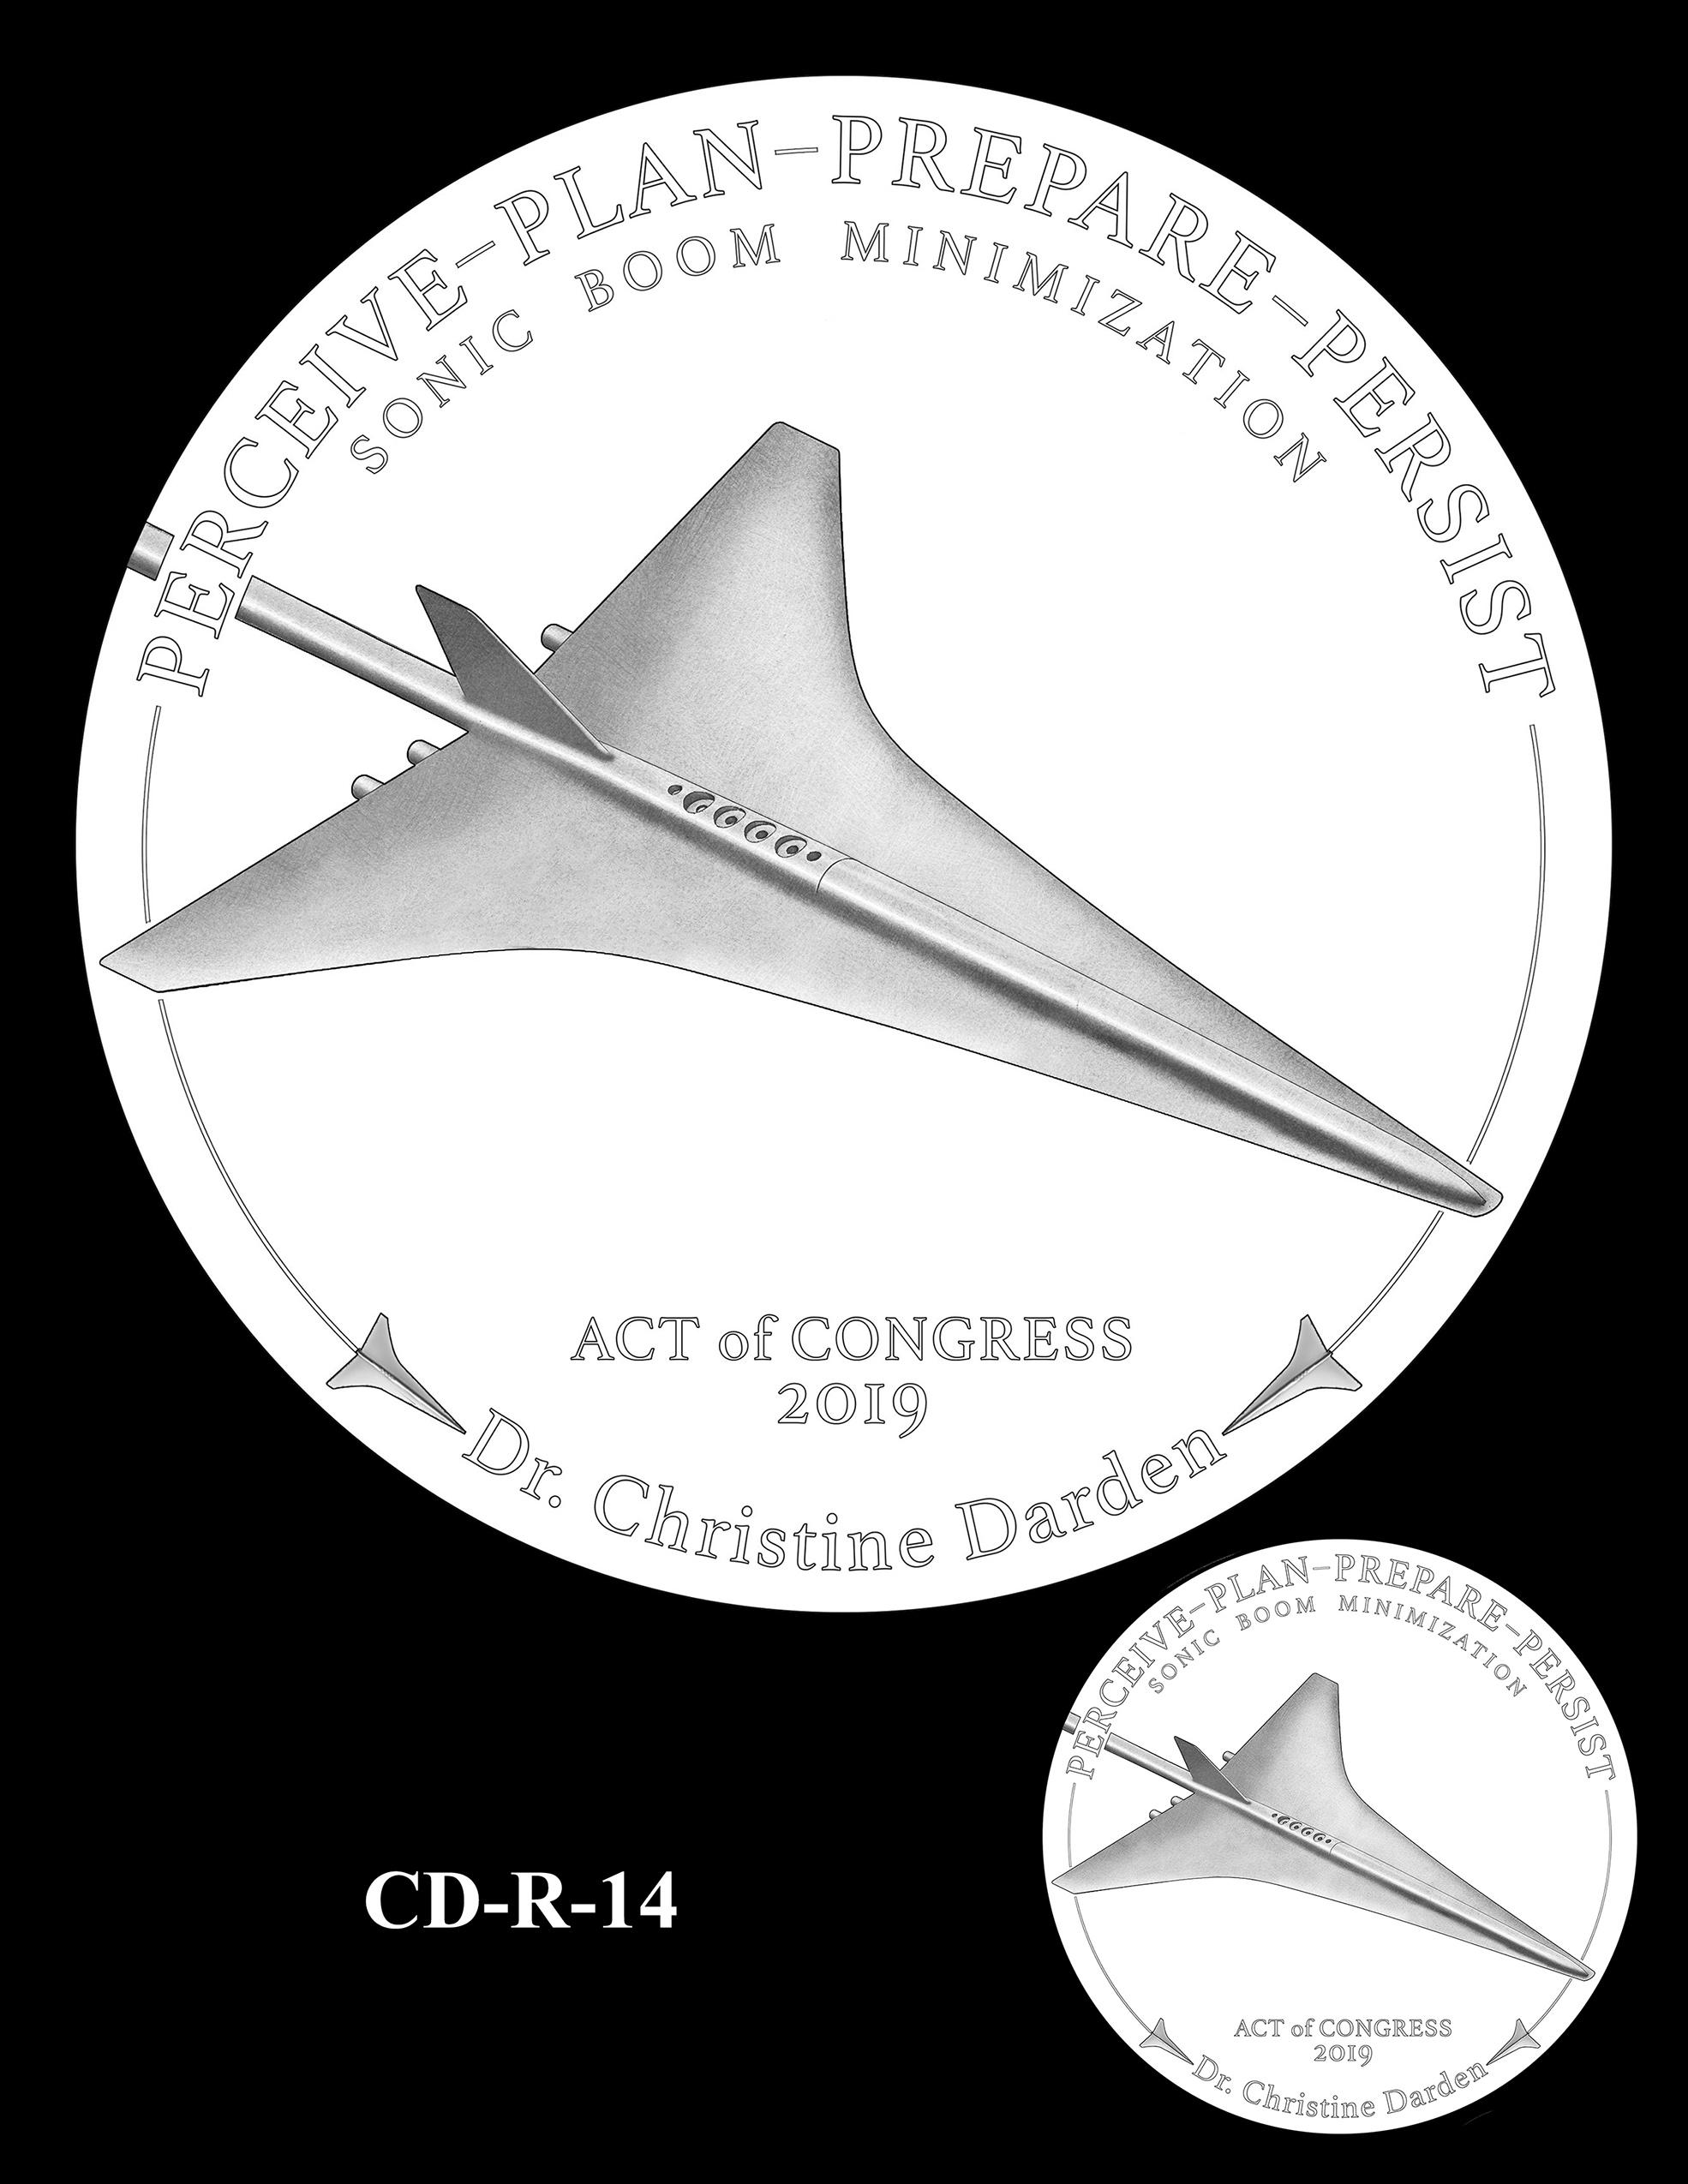 CD-R-14 -- Dr. Christine Darden Congressional Gold Medal